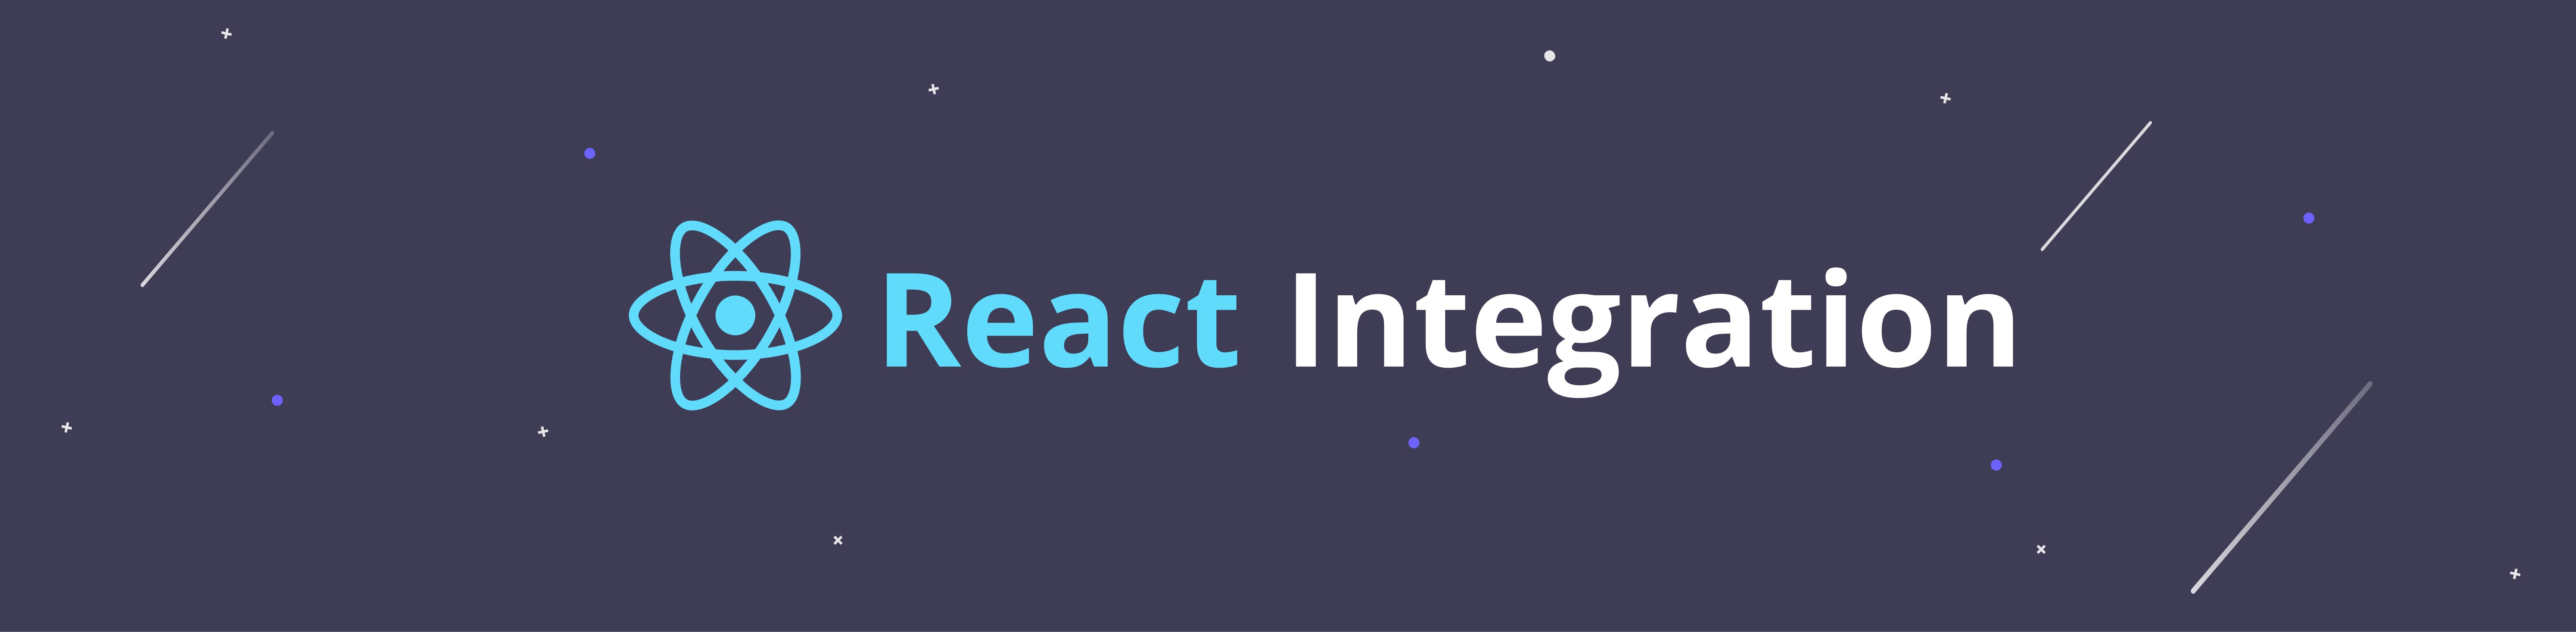 React Integration